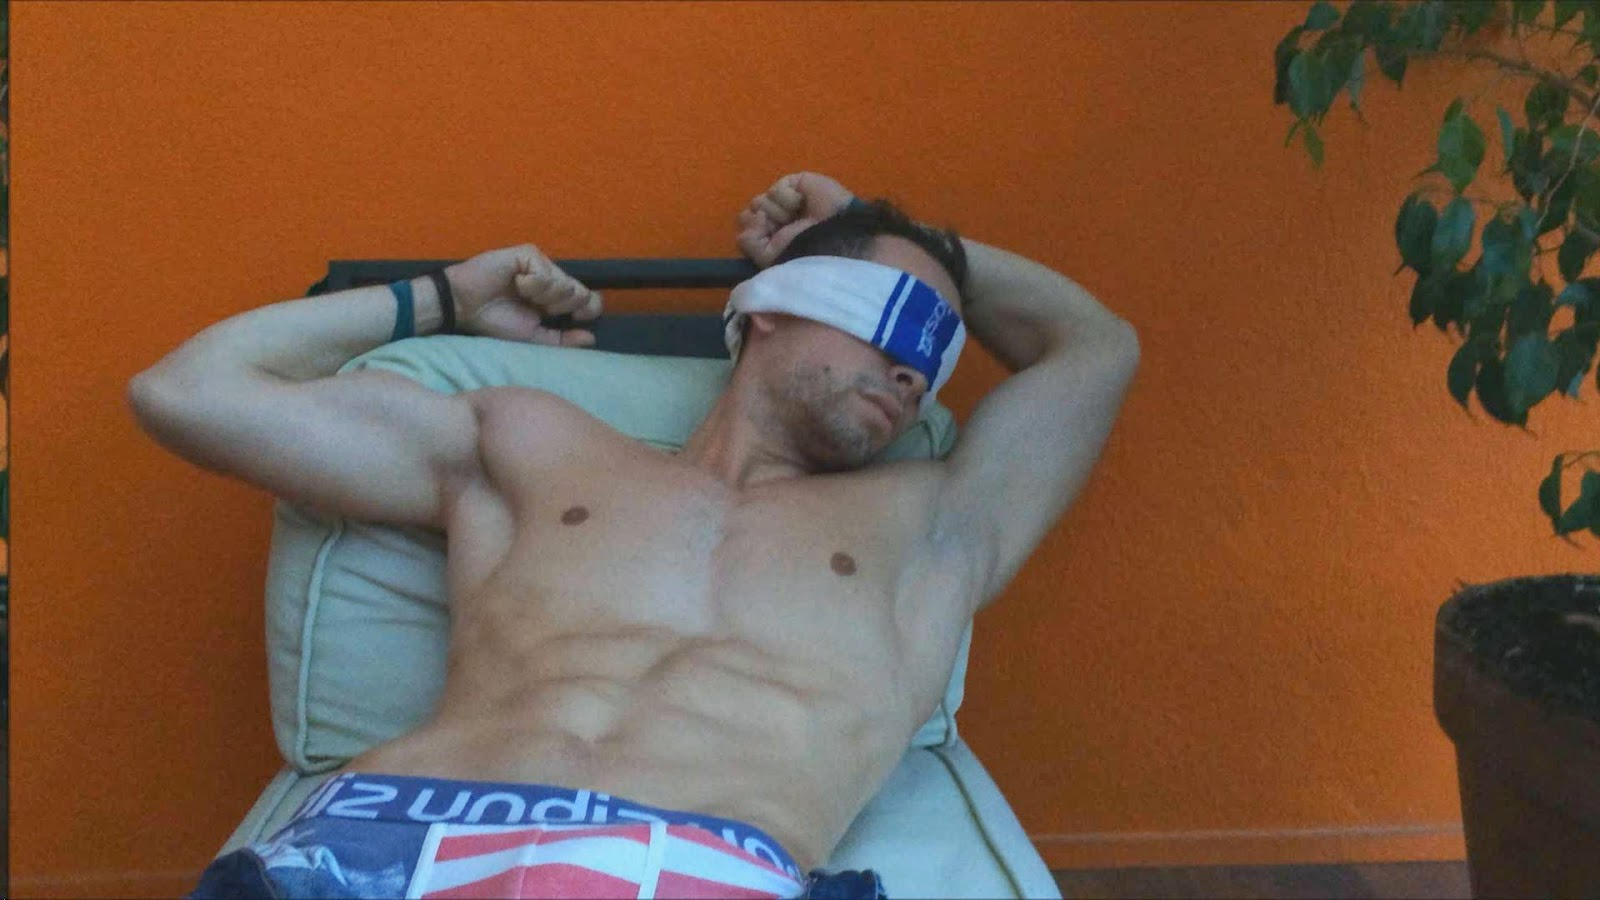 GayForIt - Free Gay Porn Videos - Chloroformed